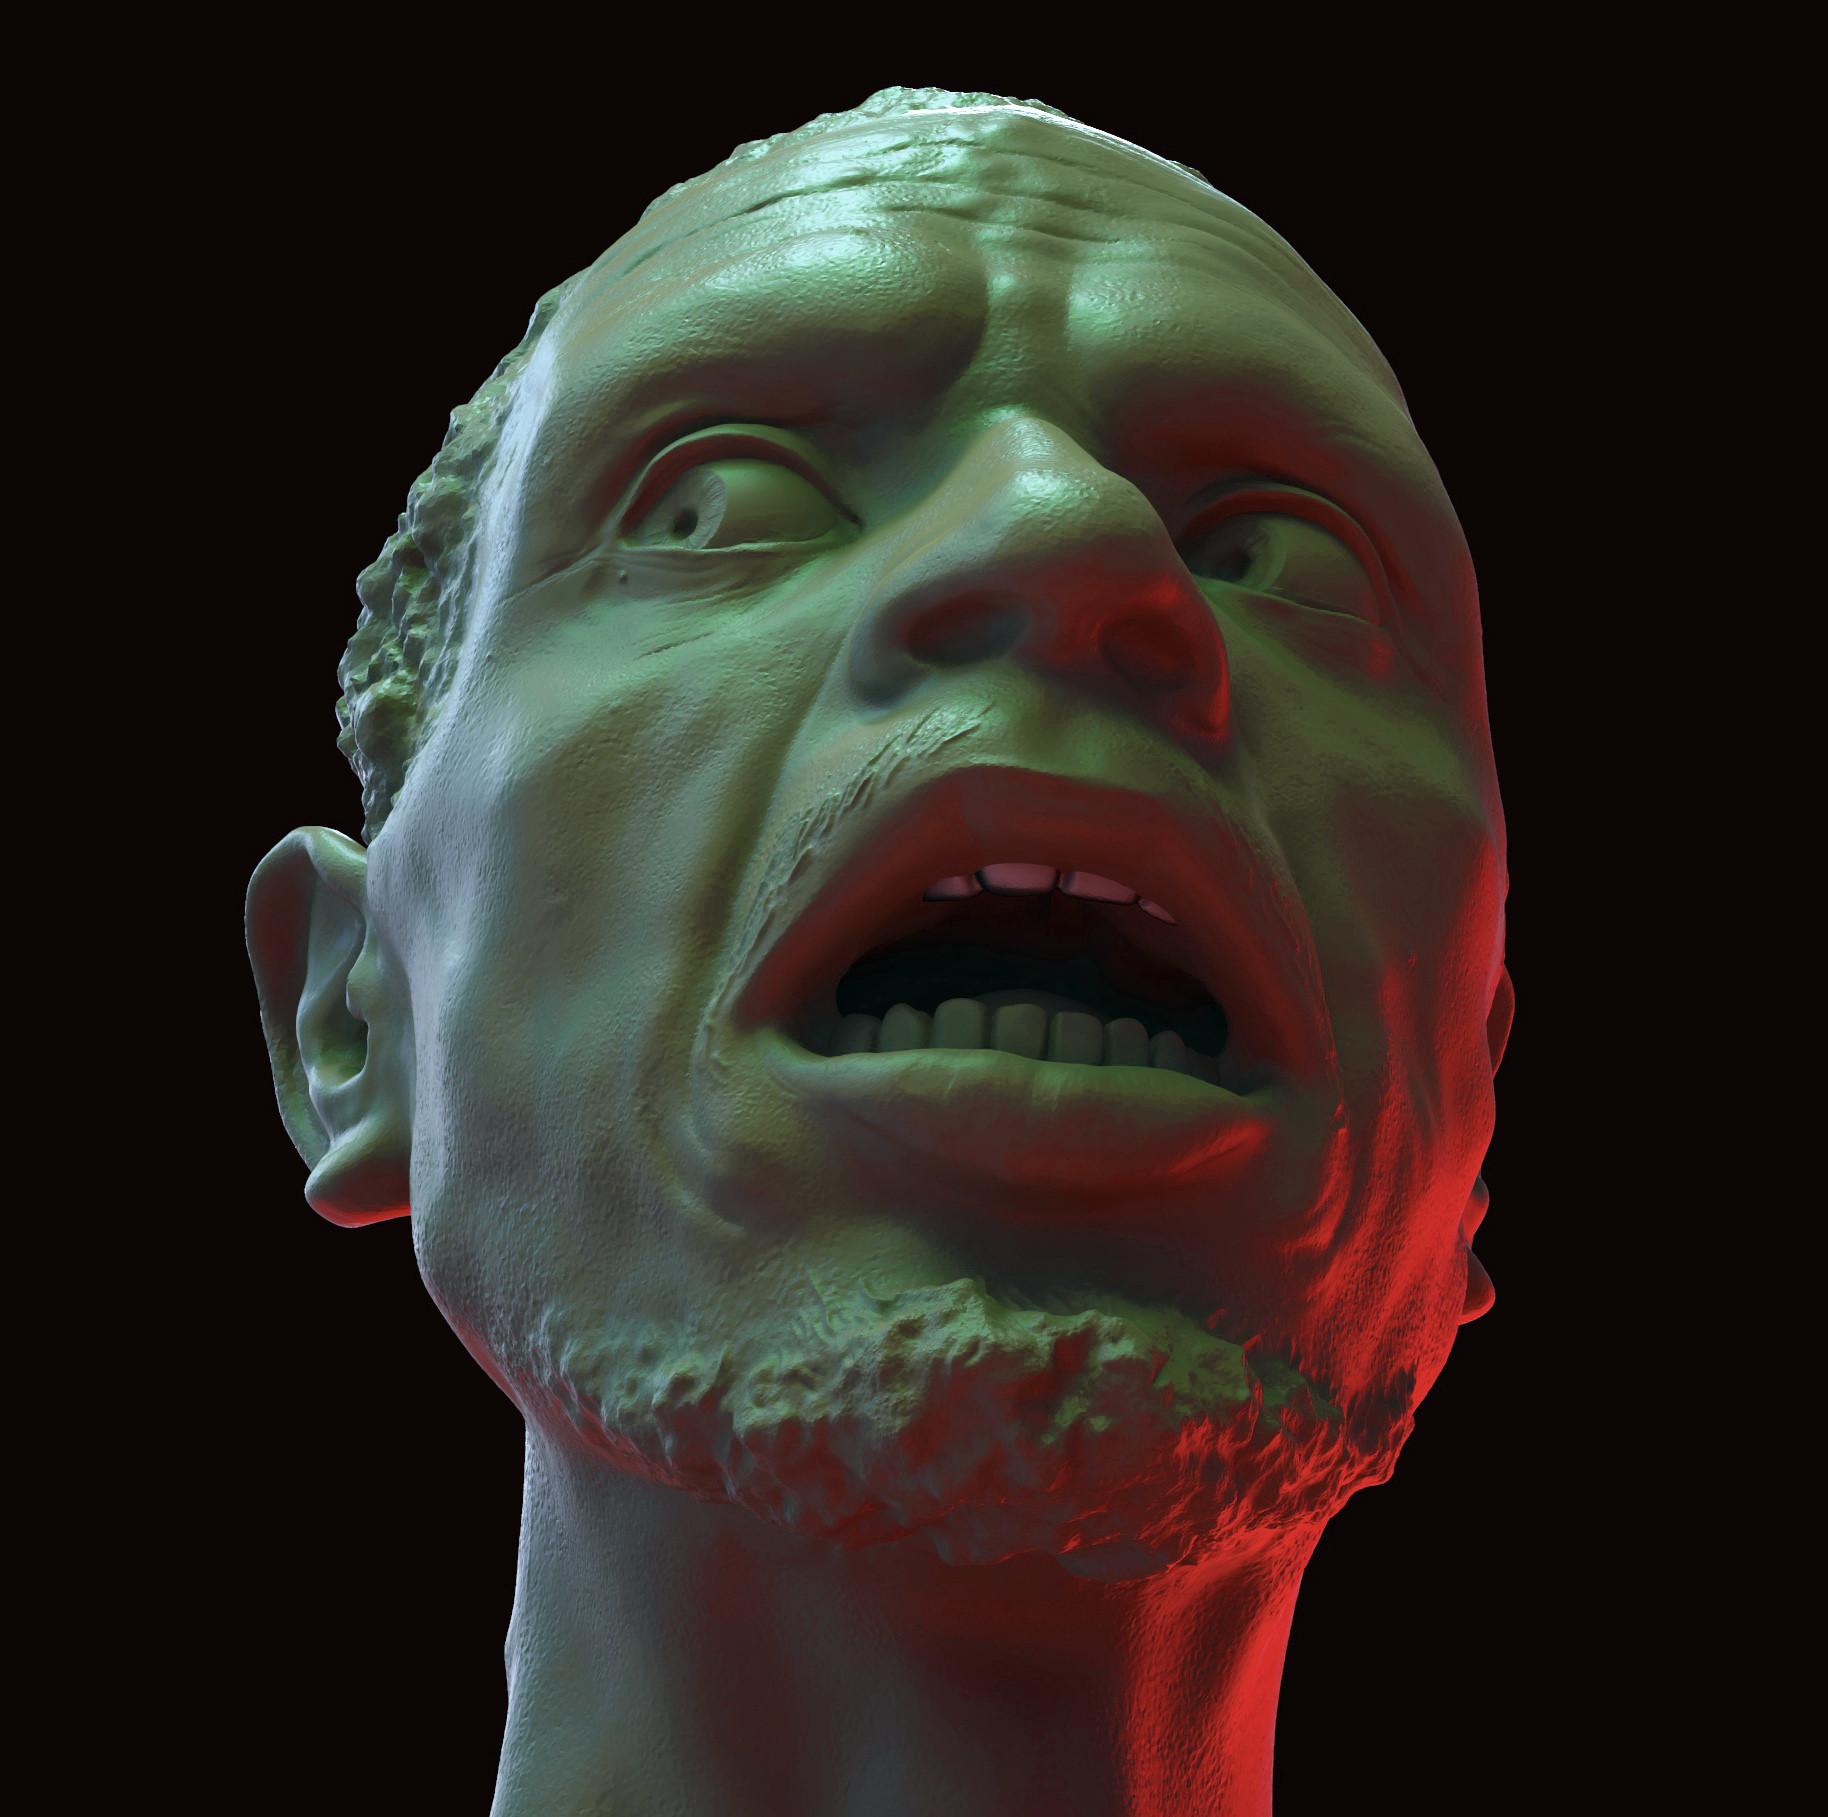 Dirk wachsmuth black male afraid 4fun color render